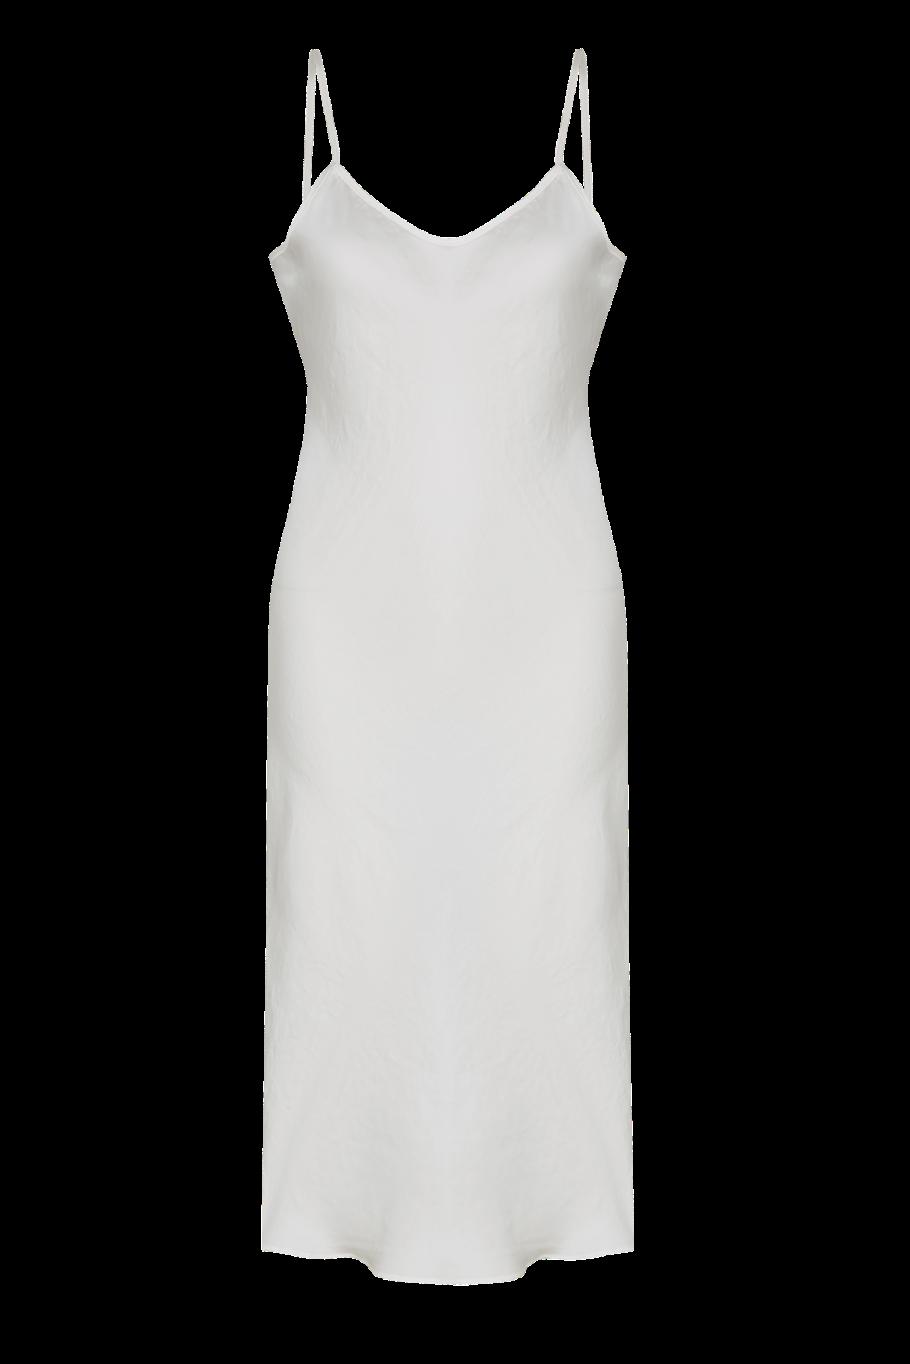 [ESSENTIAL] Camisole Dress Ivory (비침방지)